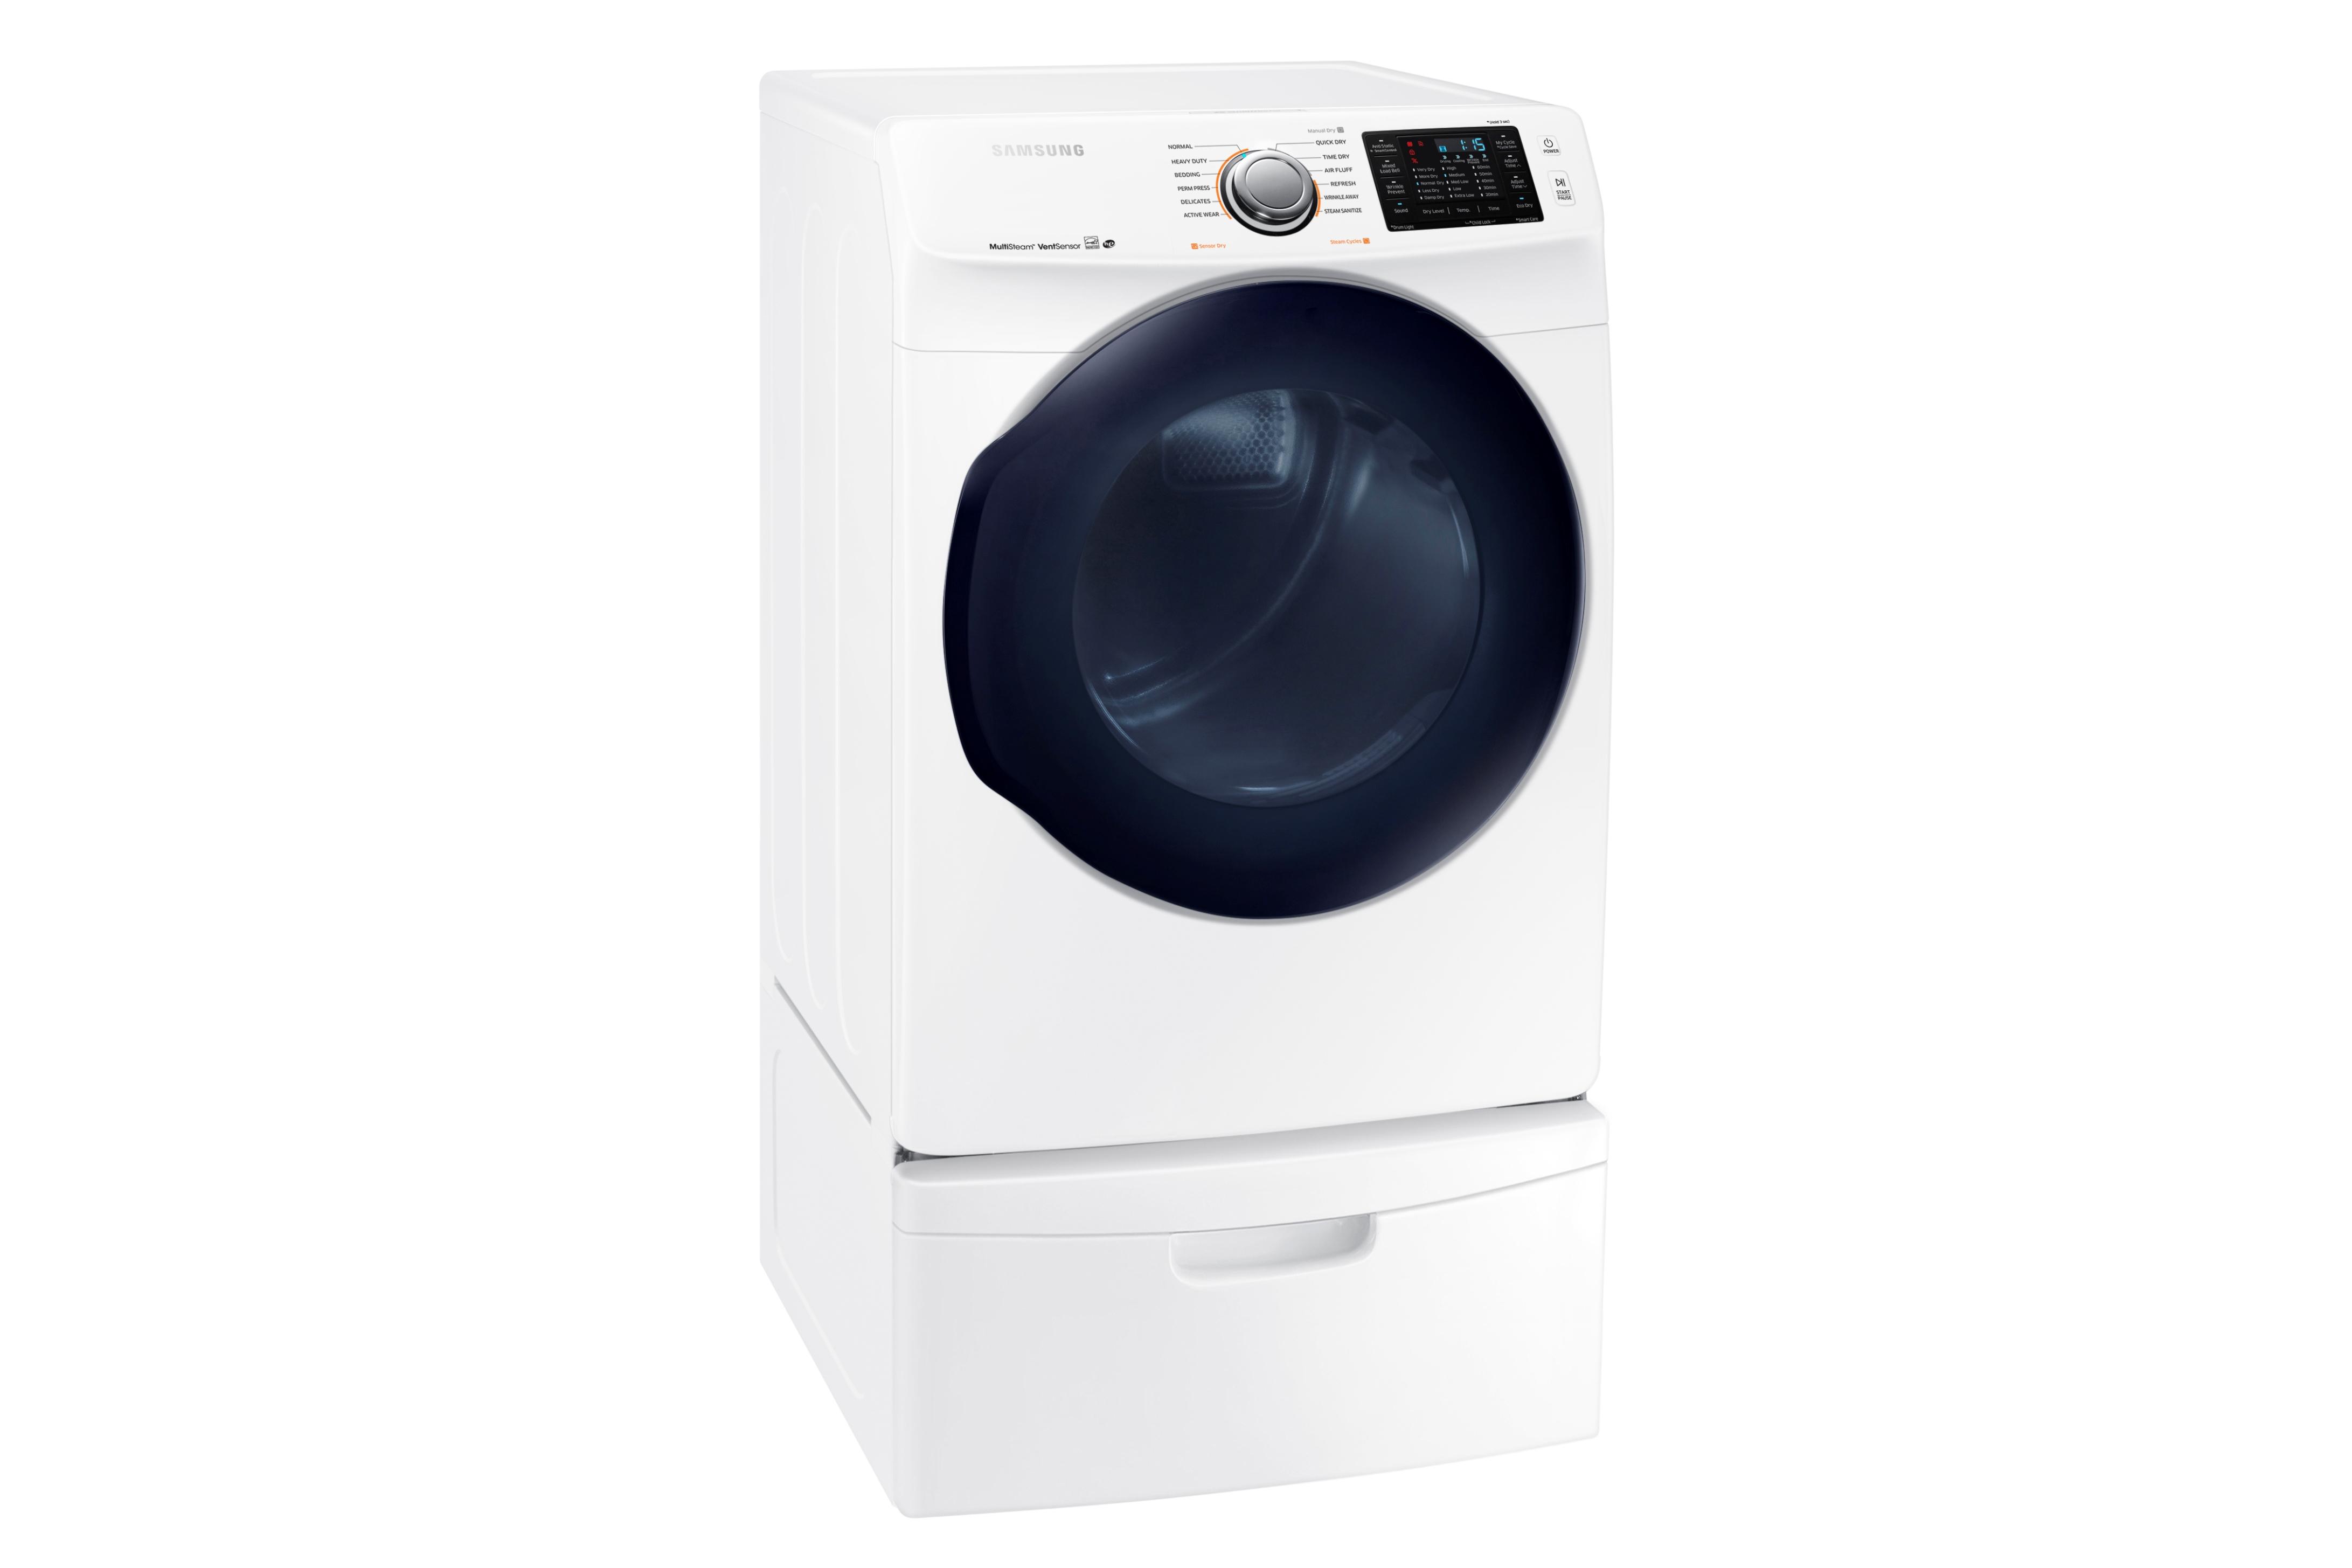 Samsung DV45K6200GW 7.5 cu. ft. Capacity Gas Dryer (White)